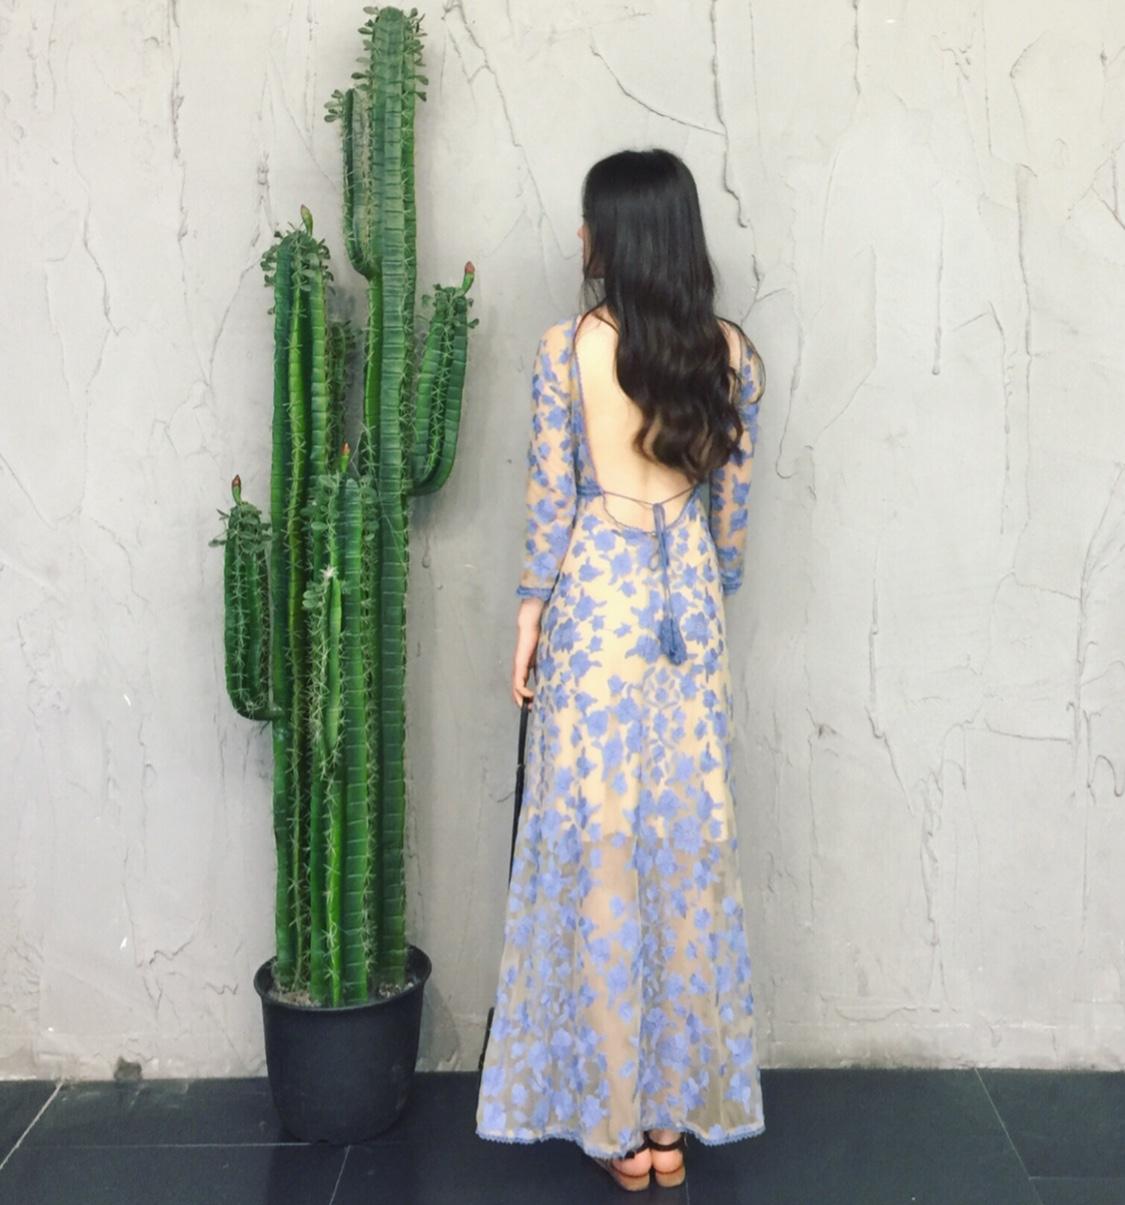 viss金露背沙滩裙女海边度假显瘦刺绣蕾丝镂空性感长裙蓝色连衣裙